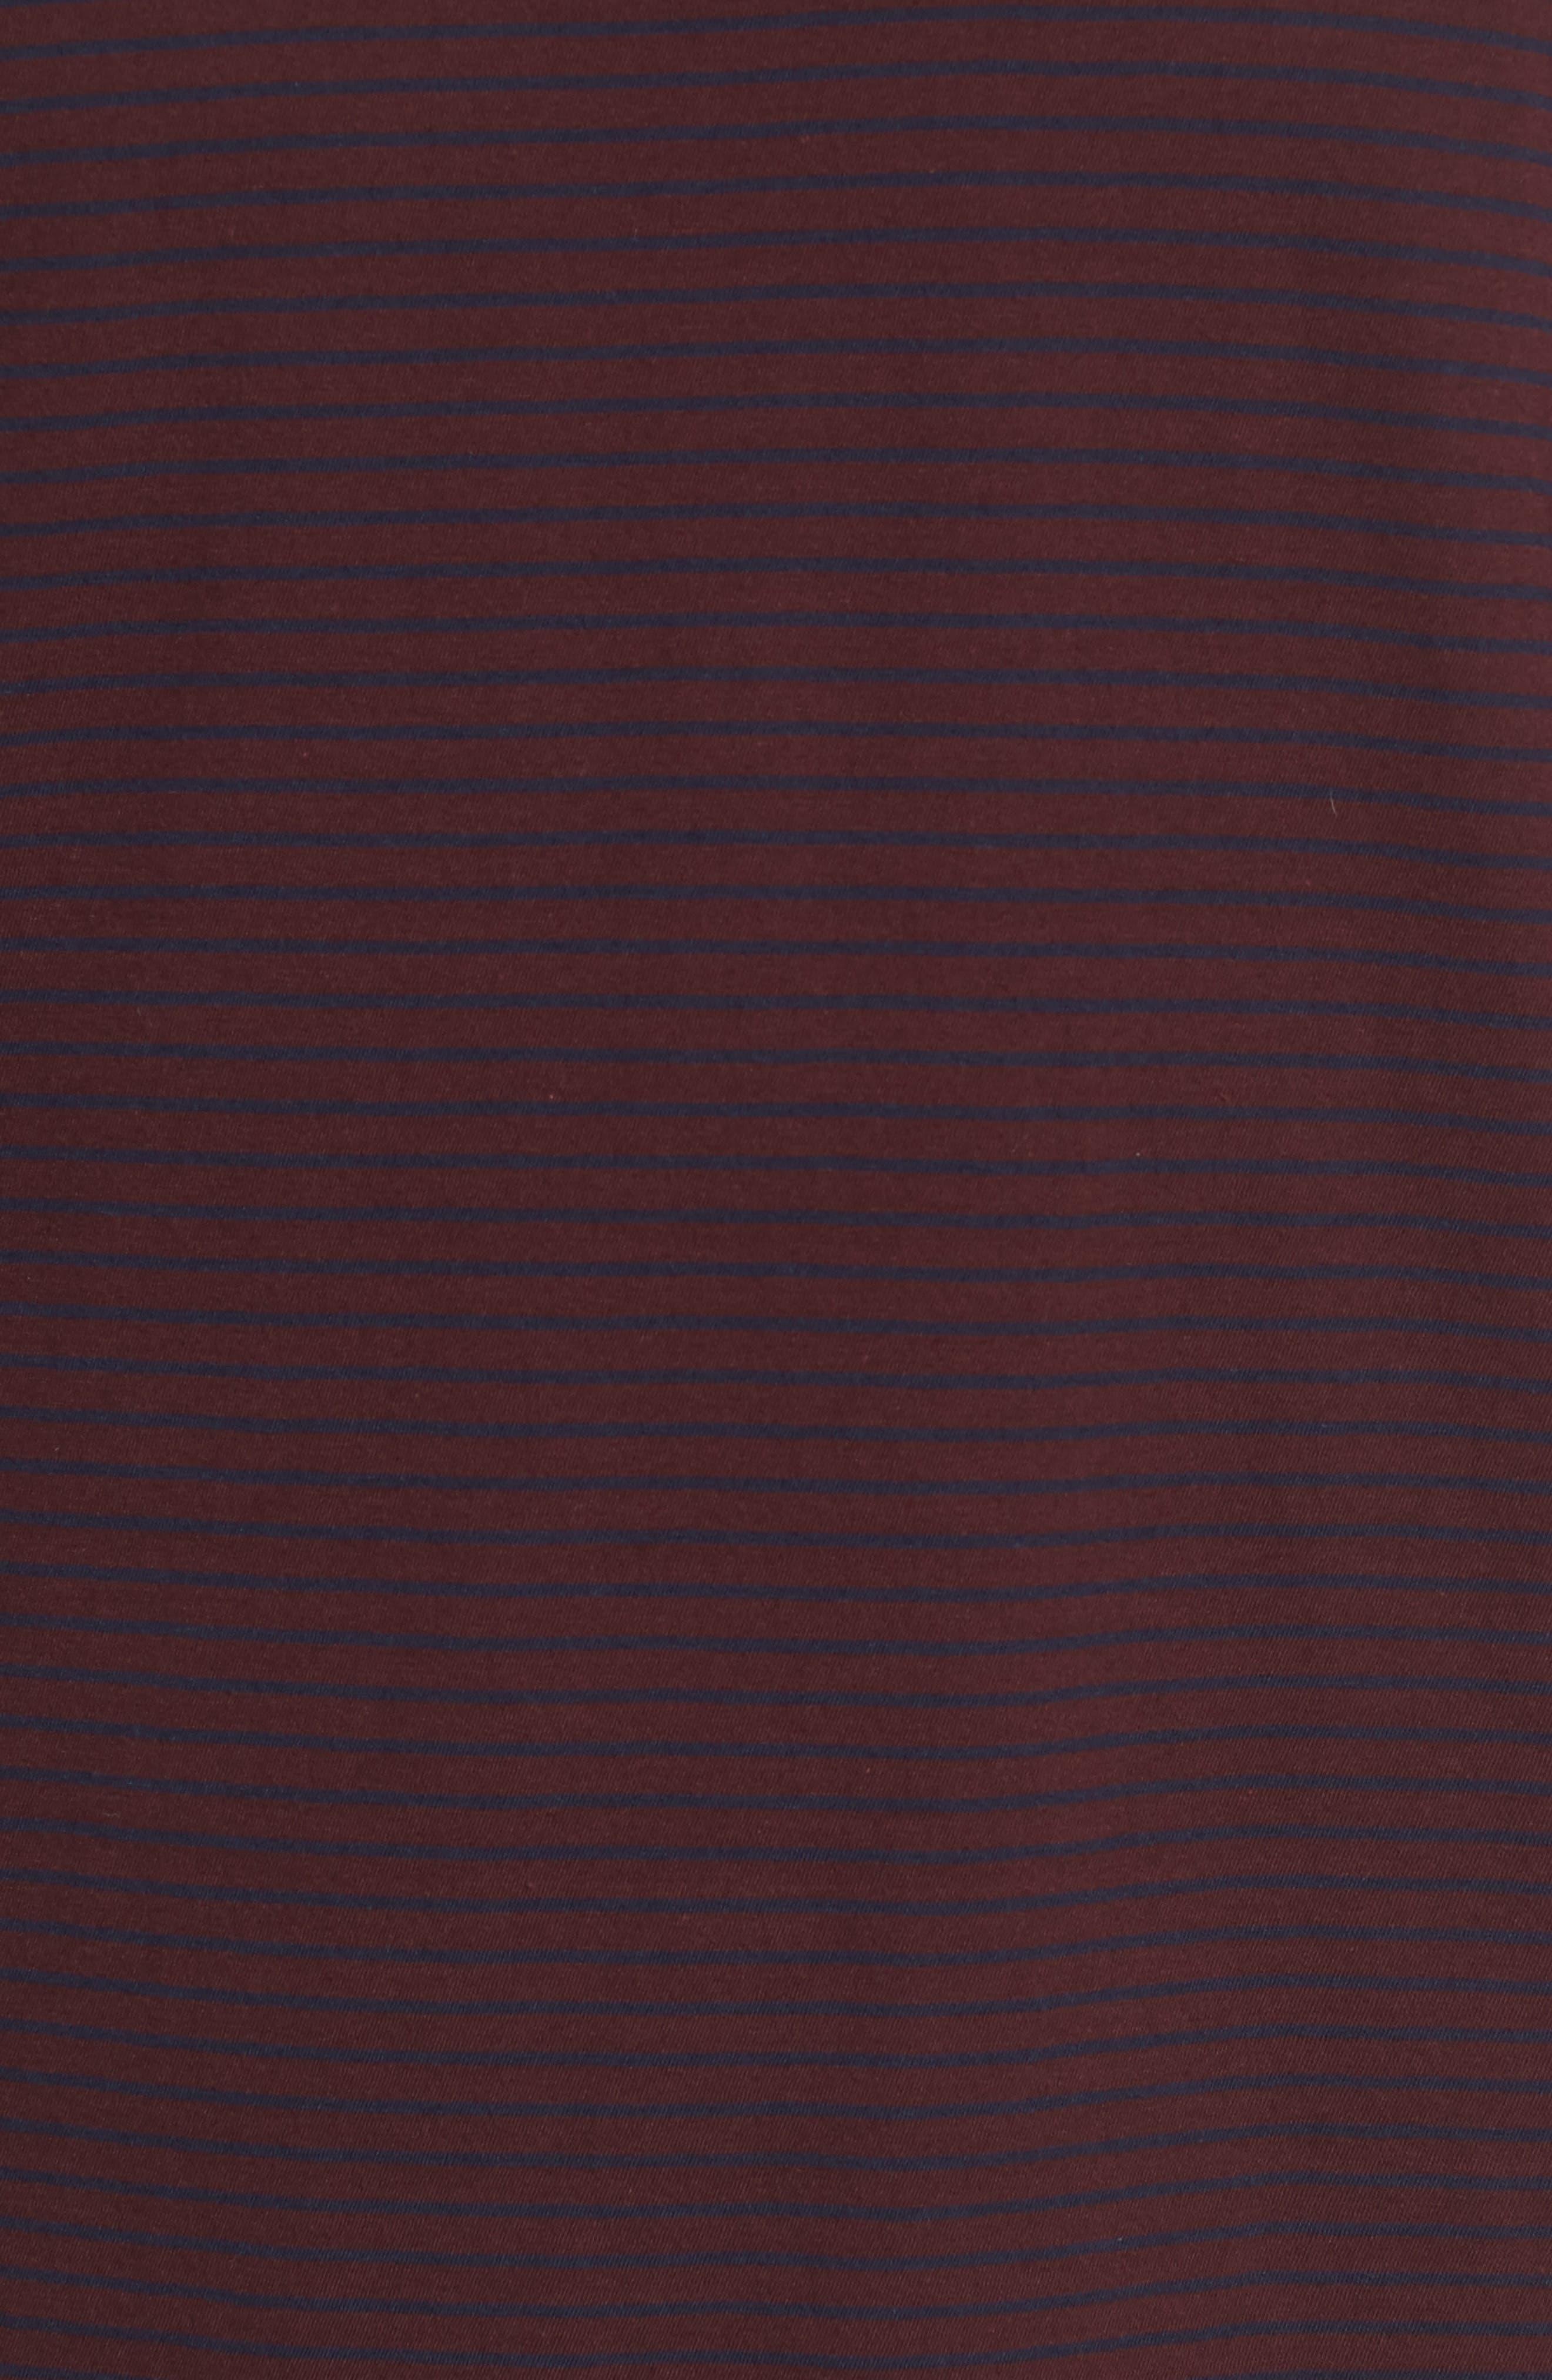 Stripe Long Sleeve Crewneck T-Shirt,                             Alternate thumbnail 5, color,                             Black Cherry/ New Coastal